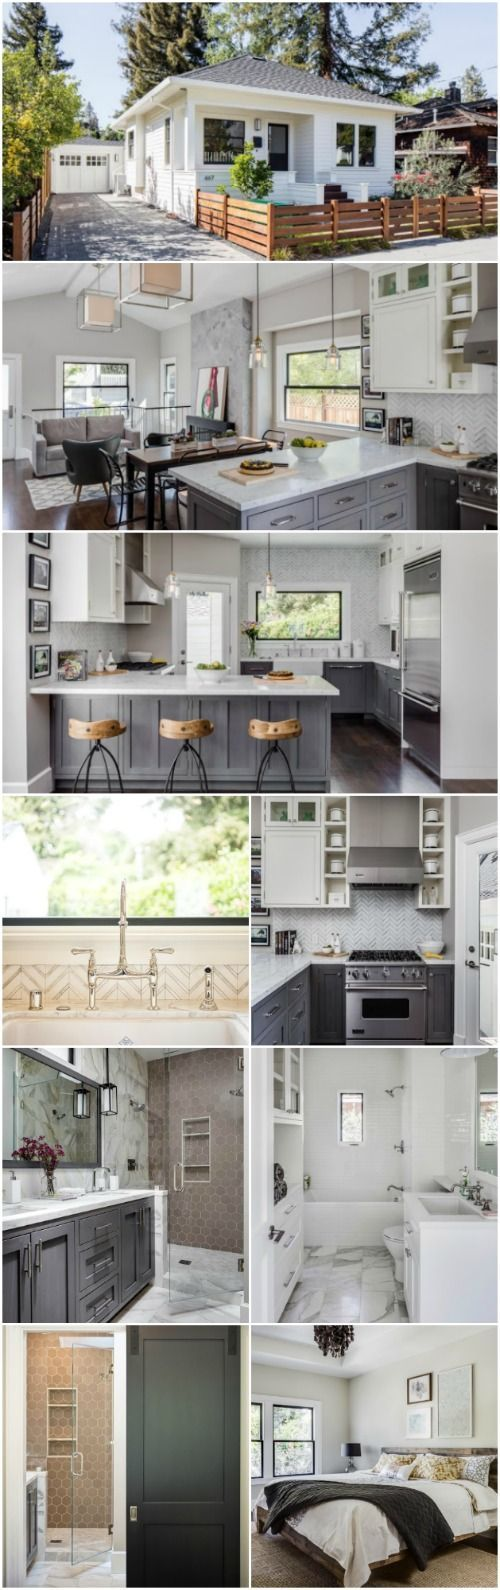 Best 25+ Tiny homes interior ideas on Pinterest | Tiny ...